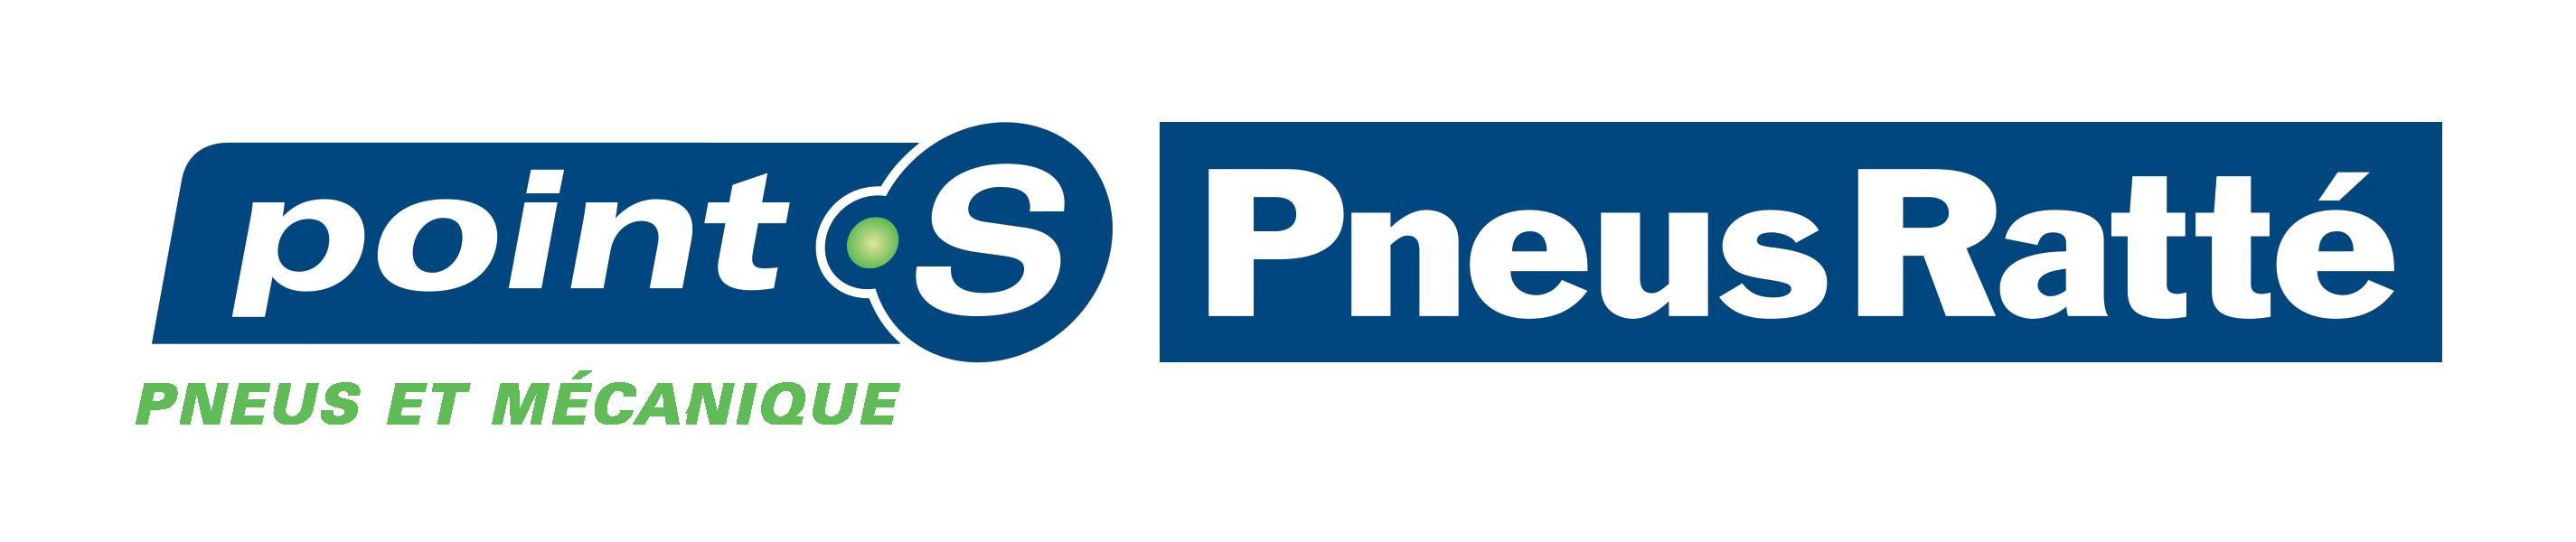 PneusRatte_PointS_Logo_H_RGB